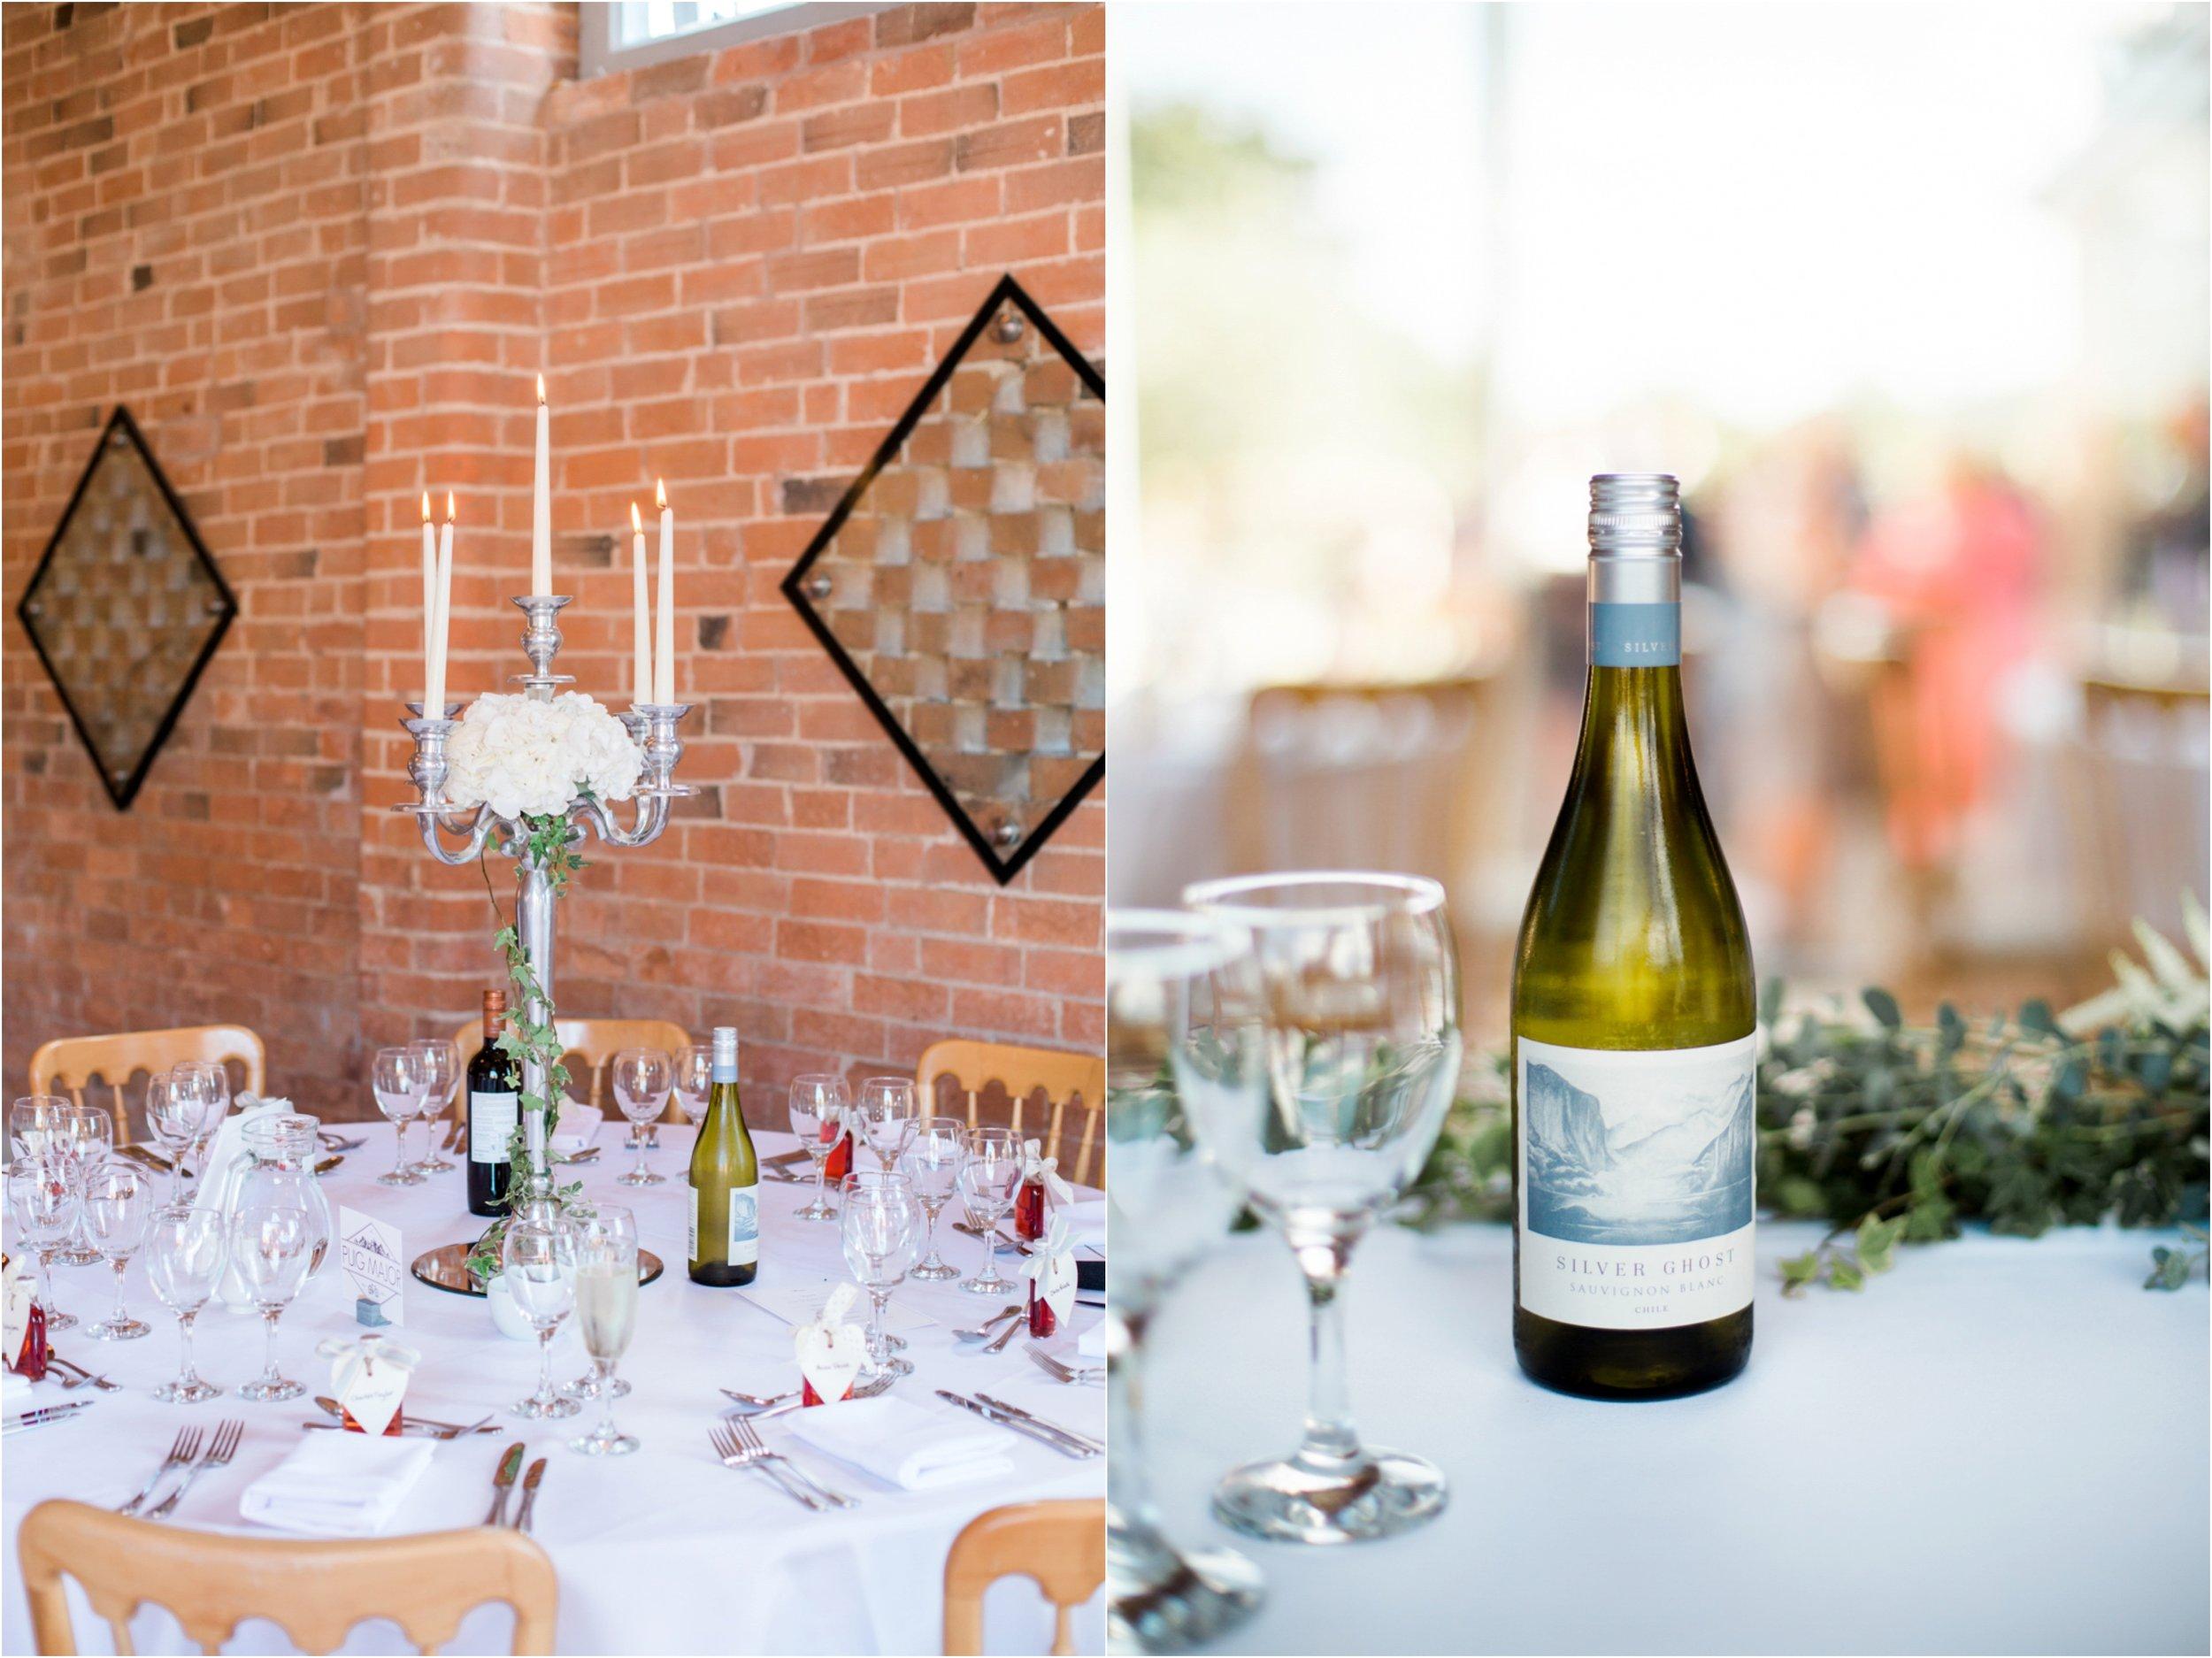 Sophie Evans Photography, Claire & John, Swallows Nest Barn Wedding, Warwickshire Wedding Photographer-108.jpg